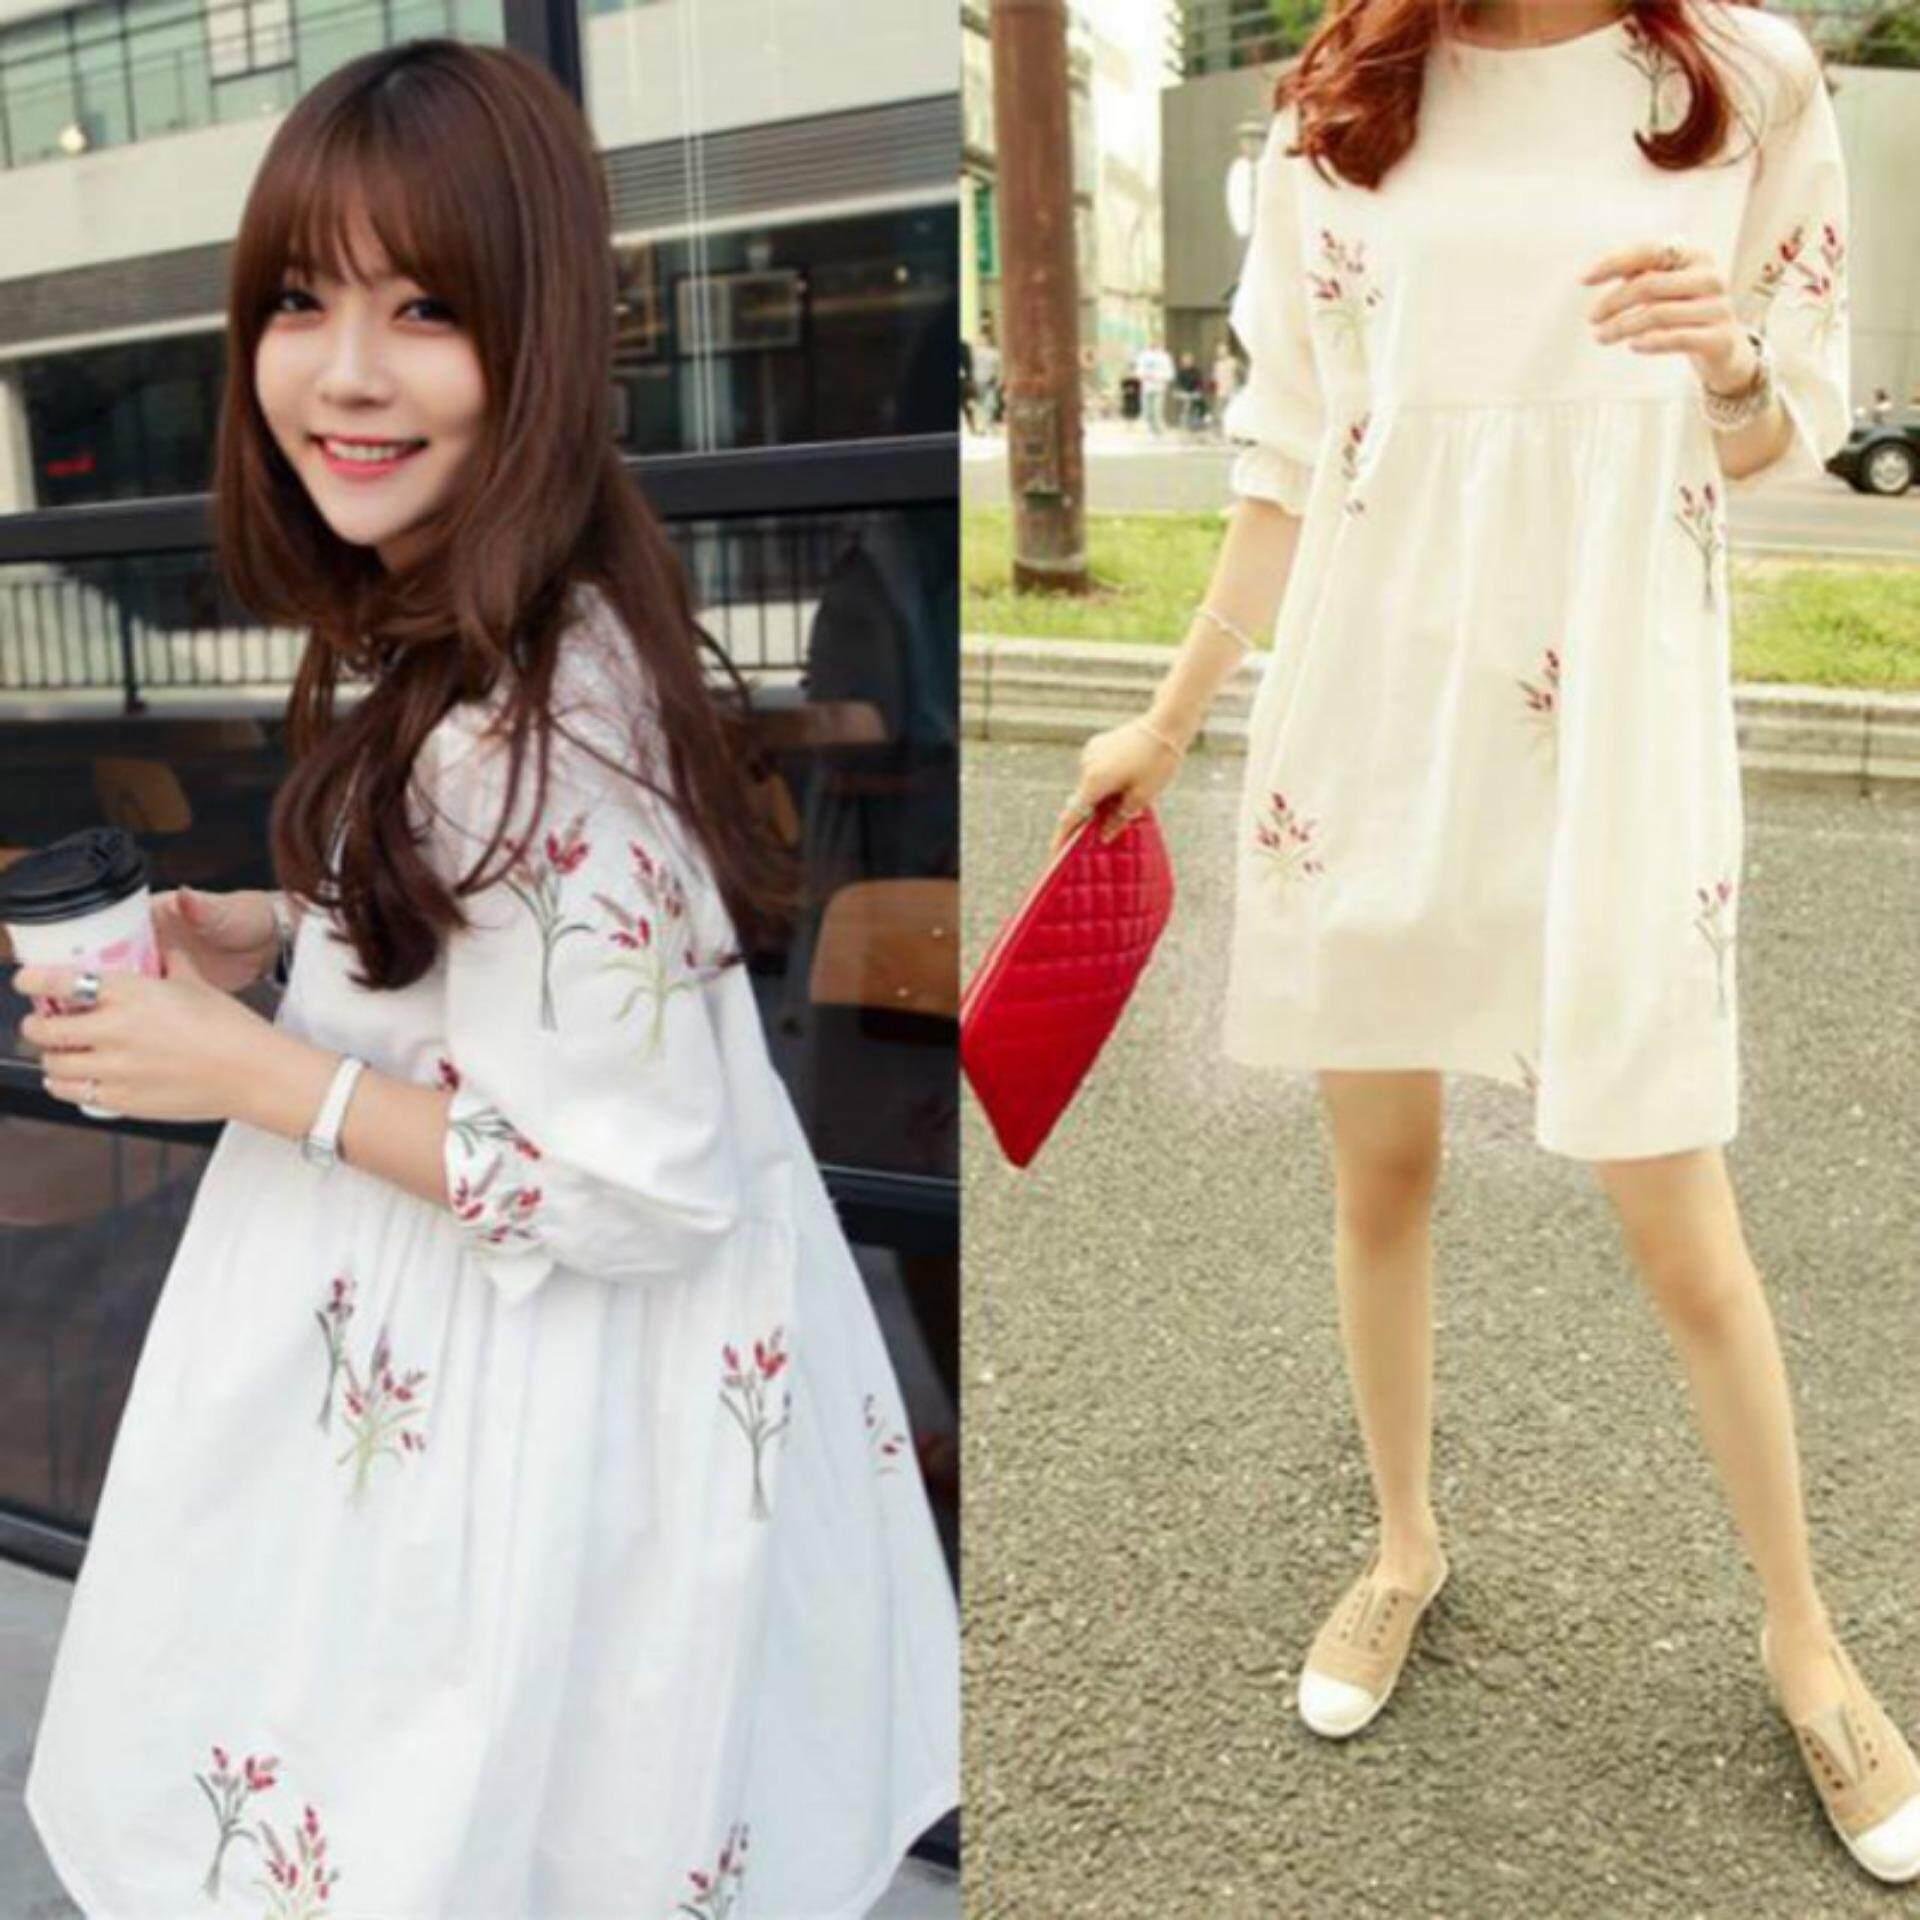 923746c803b43 China. Maternity Dresses Short Sleeve Loose Pregnant Women Pregnancy  Clothing - intl